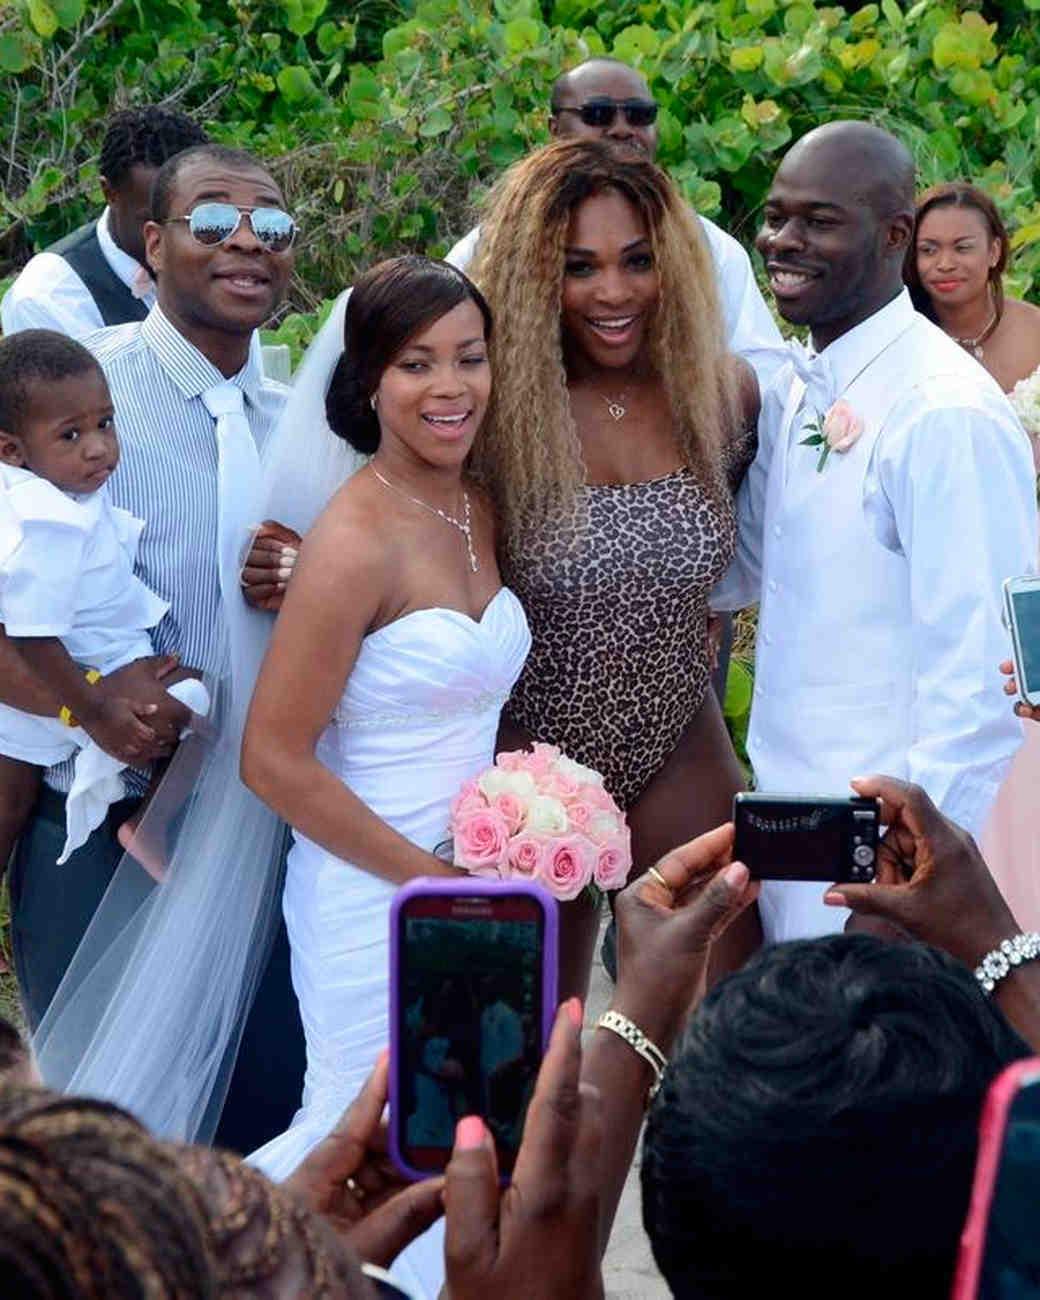 celebrity-wedding-crashers-serena-williams-1215.jpg